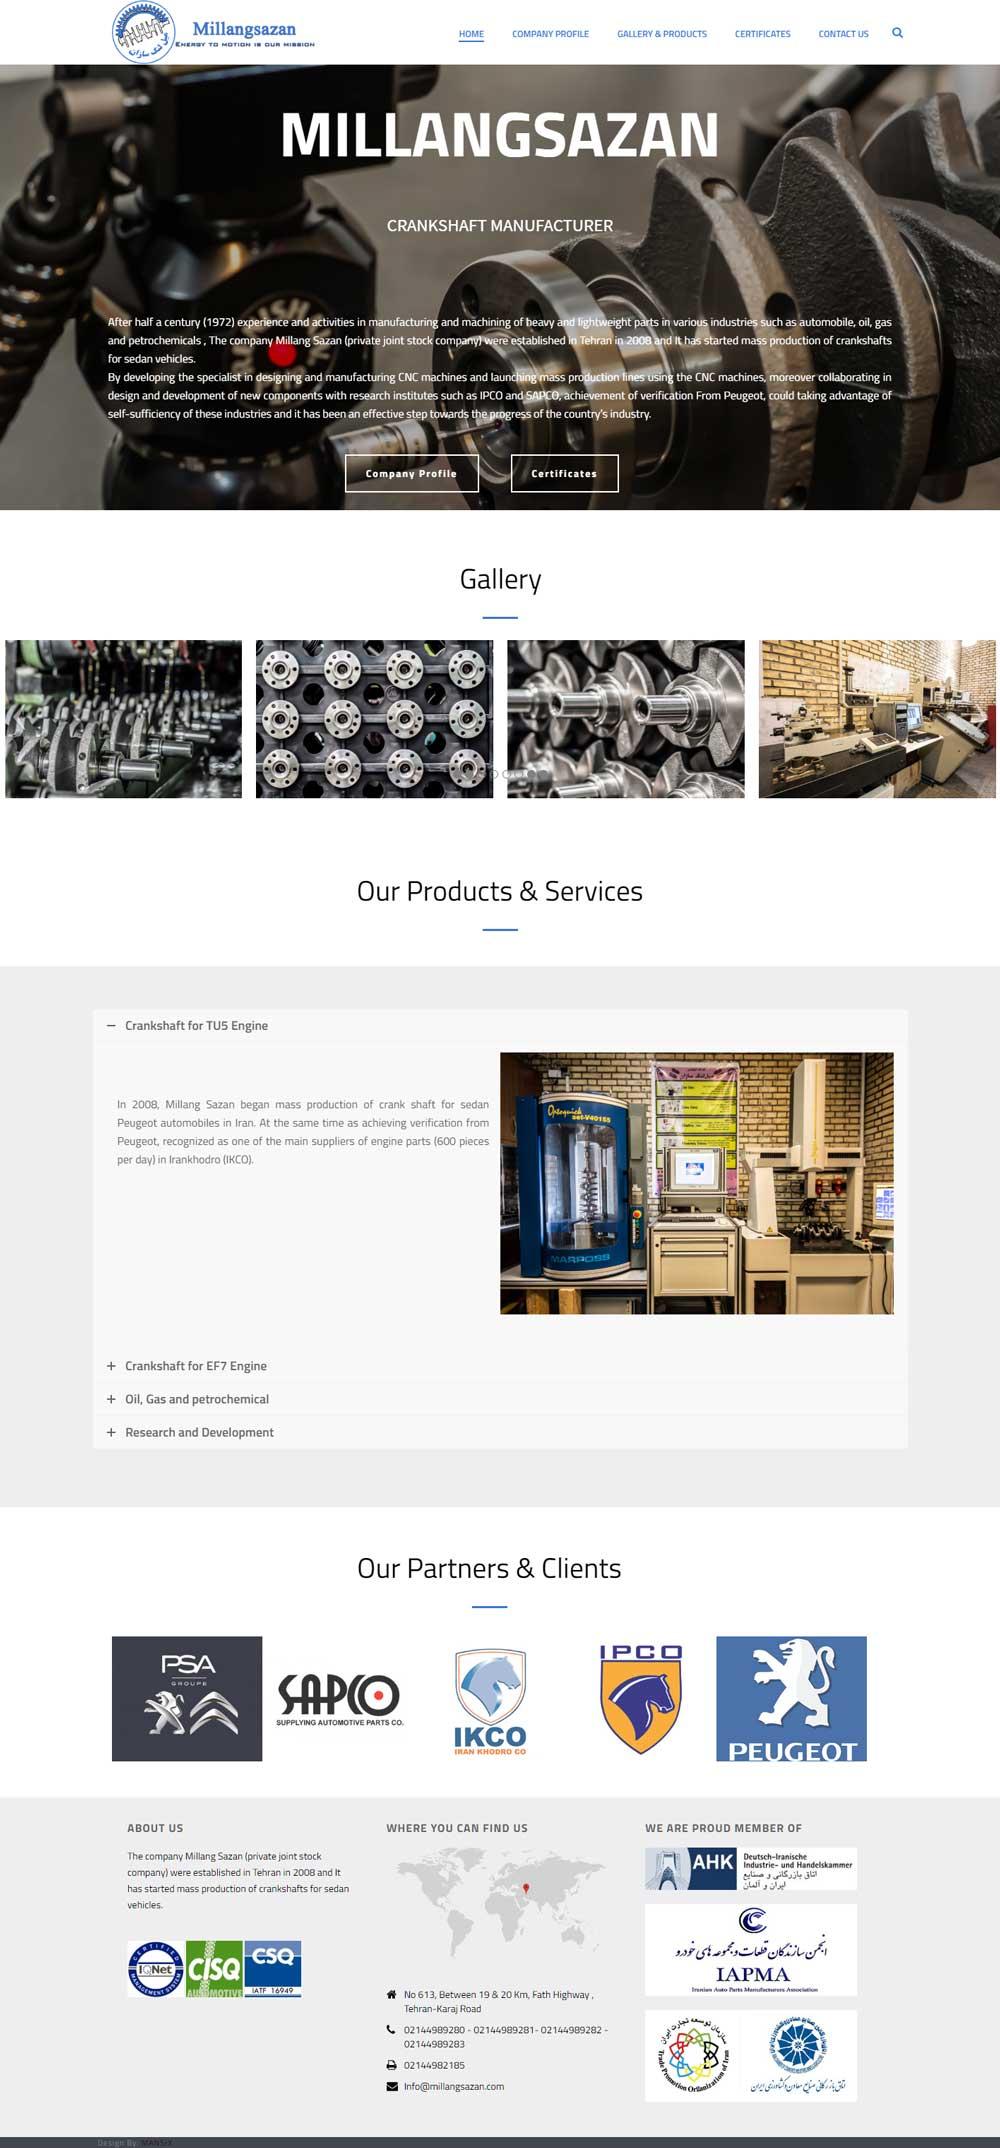 طراحی سایت انگلیسی